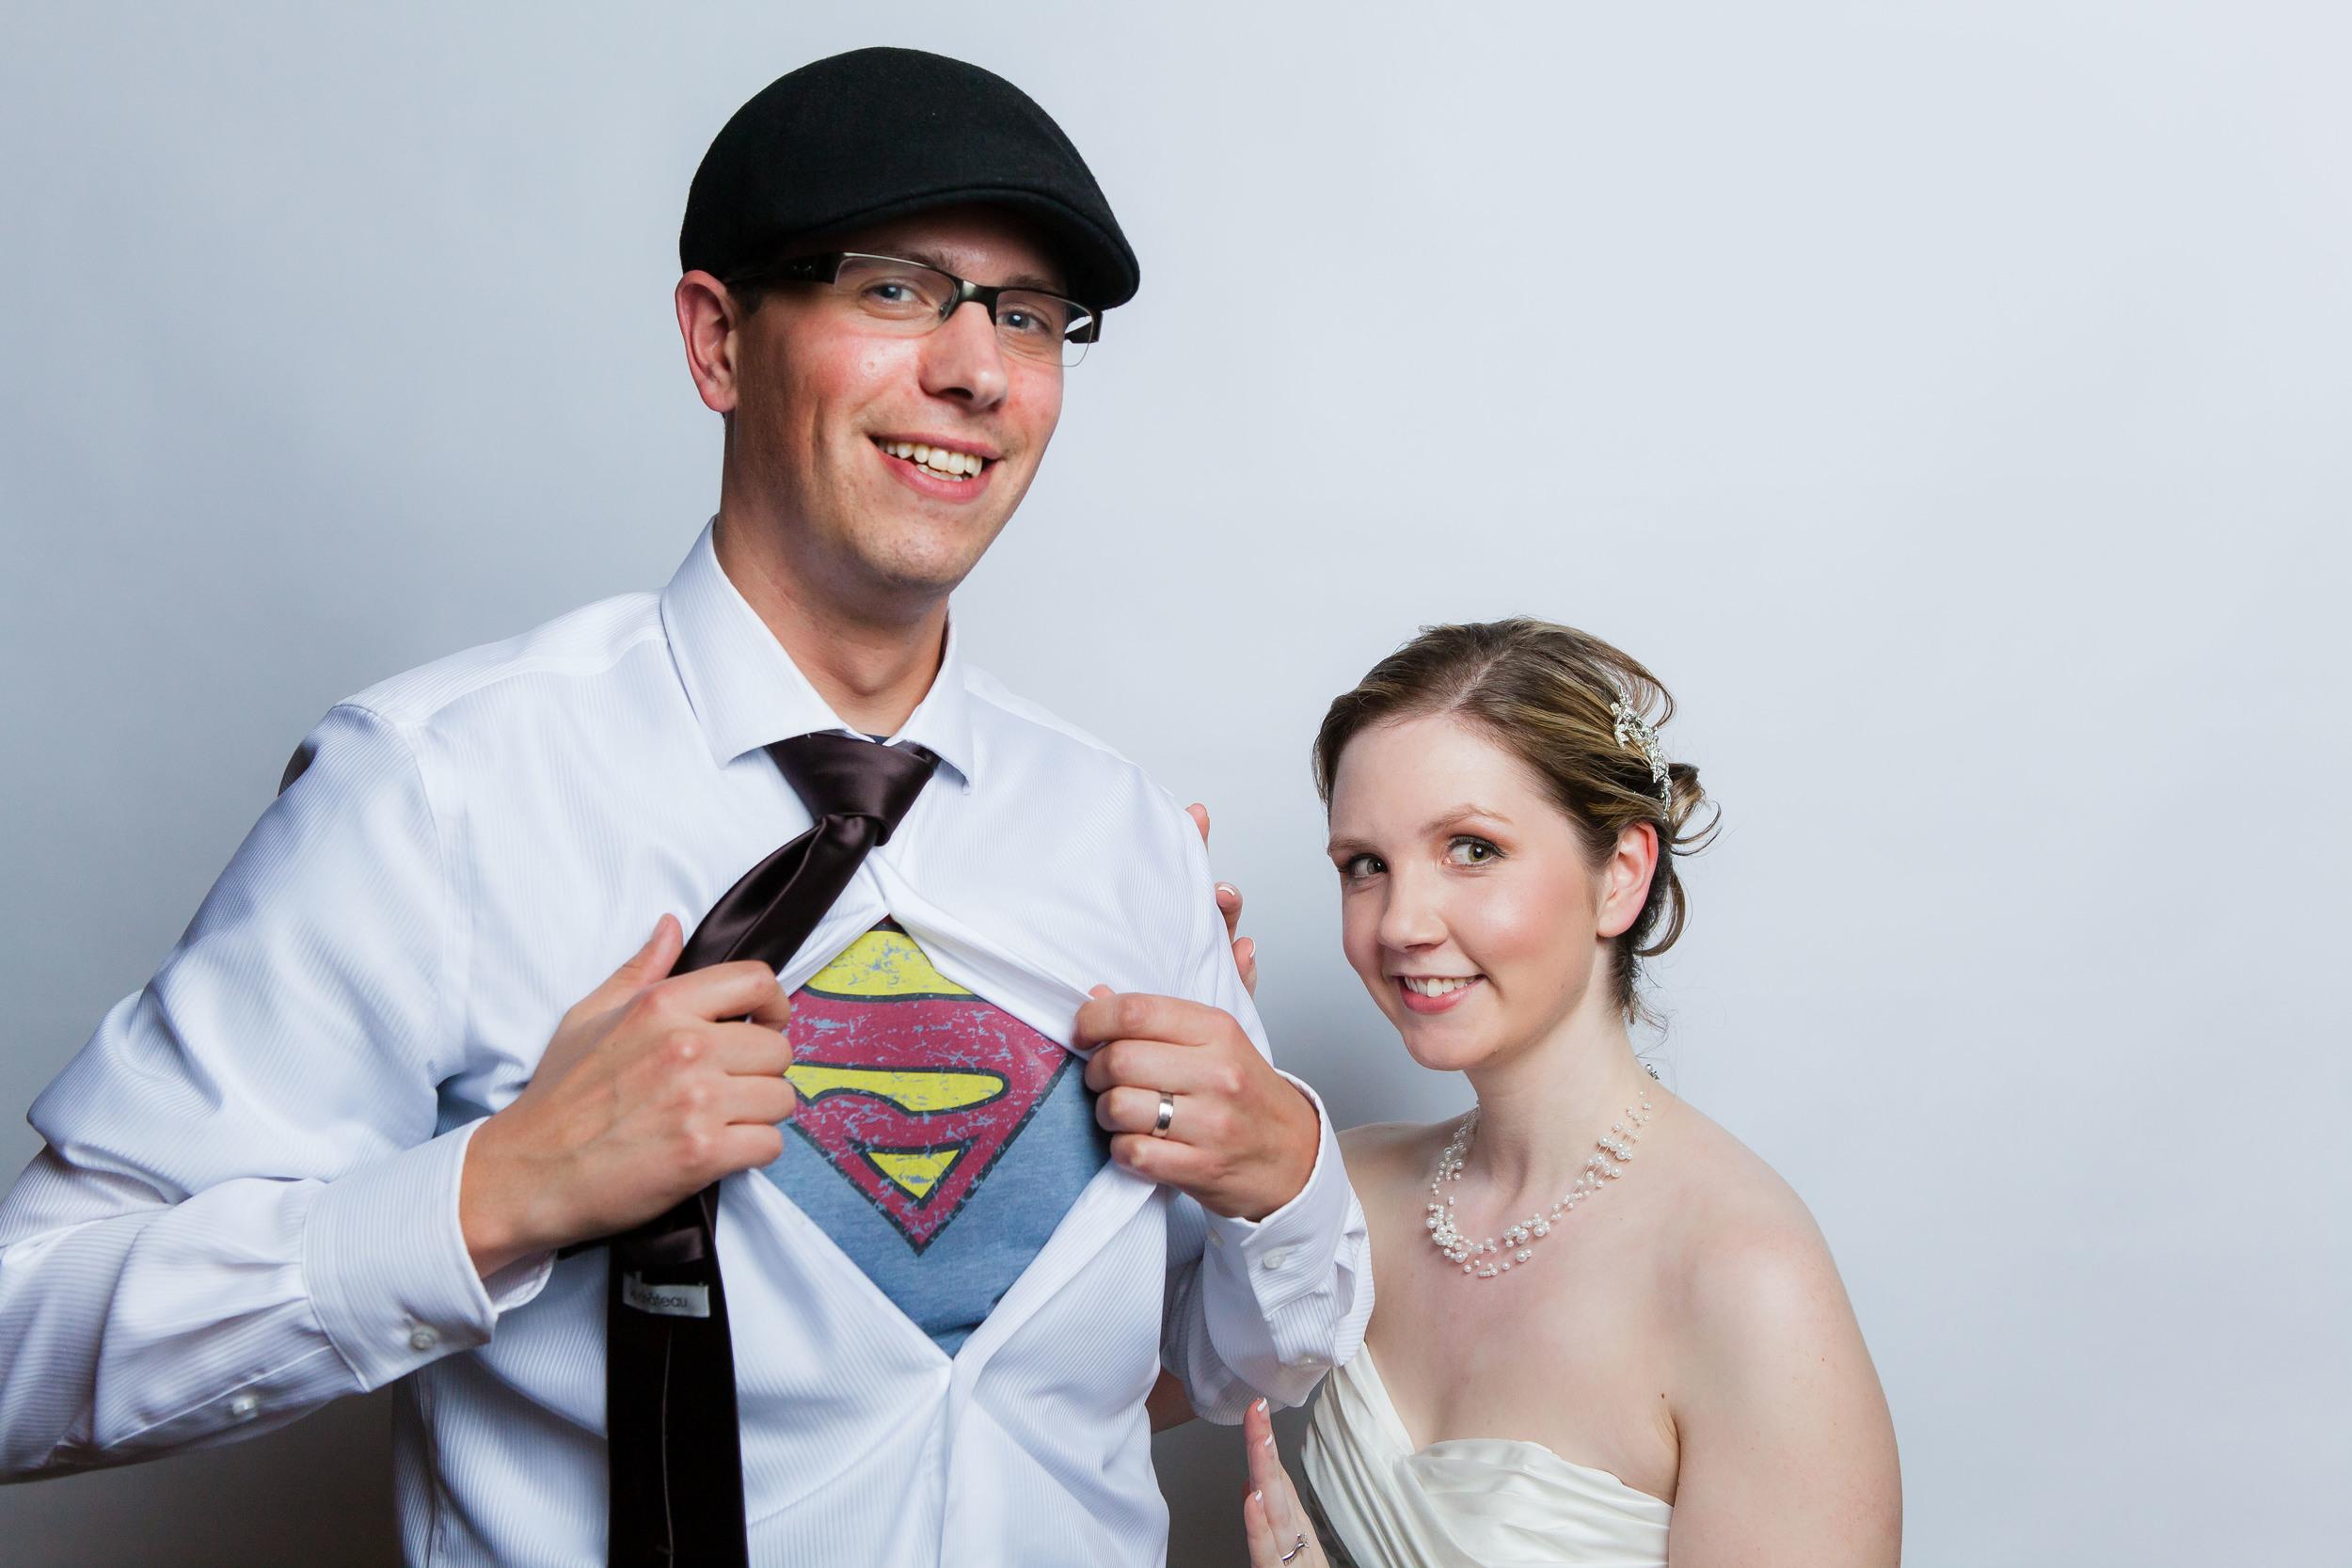 toronto_wedding_photography-Steph_Troy-33.jpg